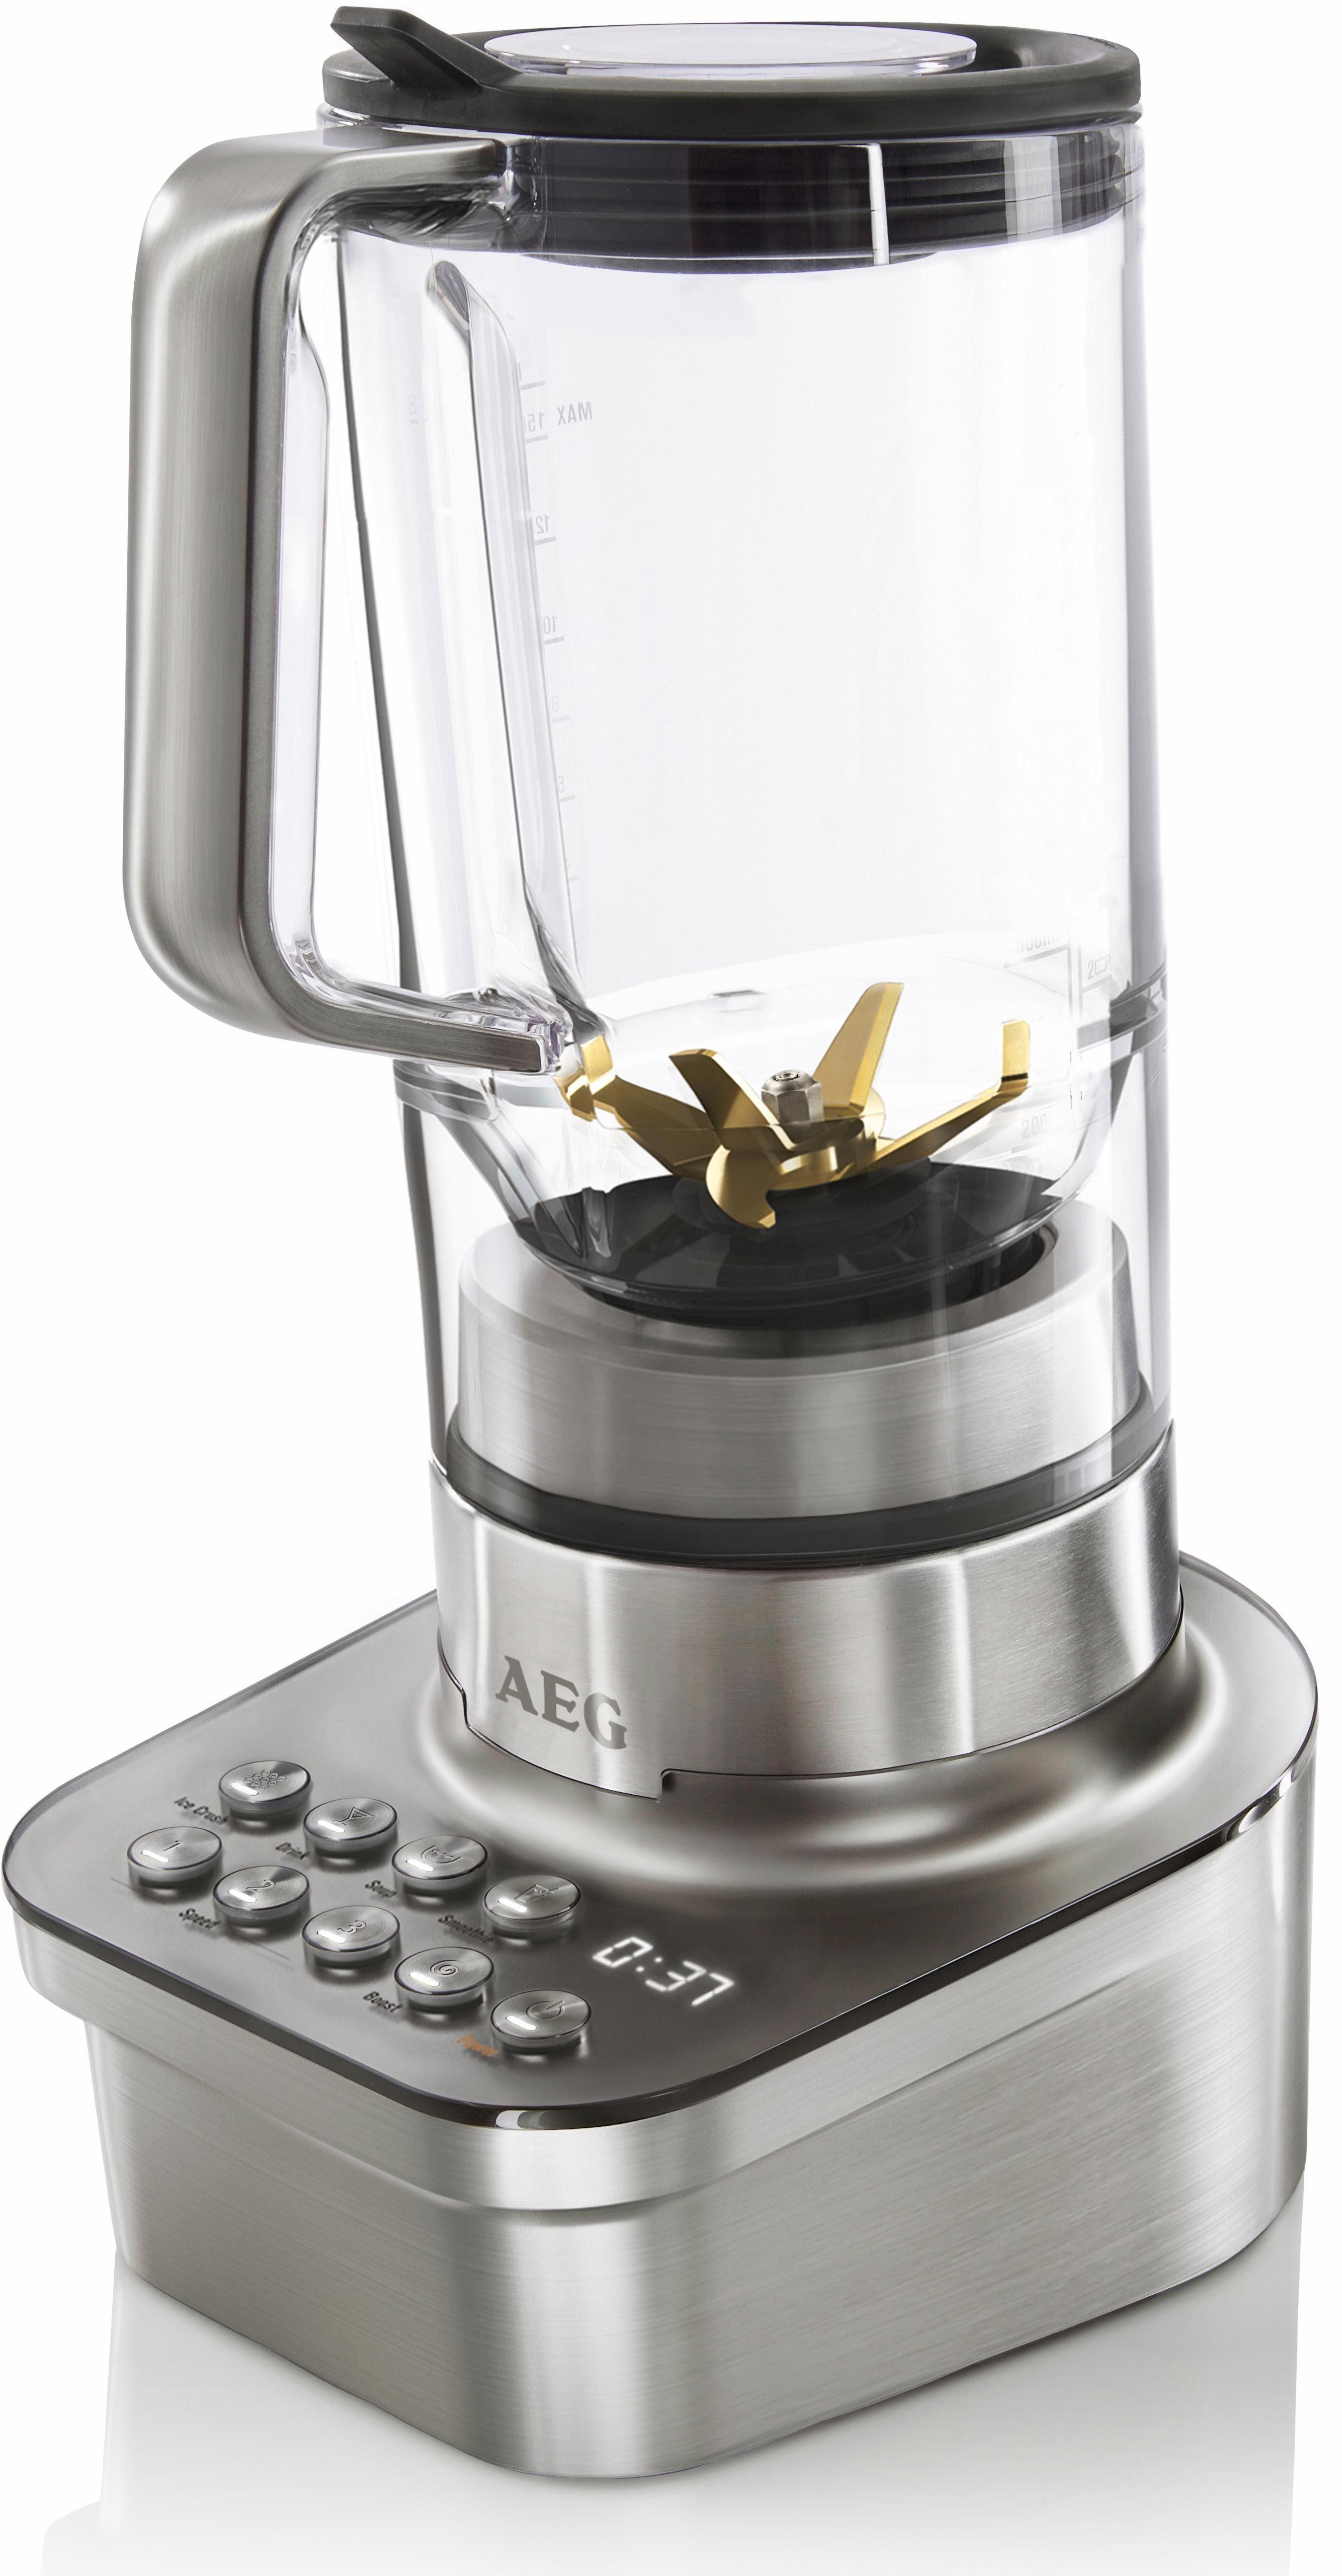 AEG Standmixer Gourmet Pro SB 9300, 1200 Watt, edelstahl